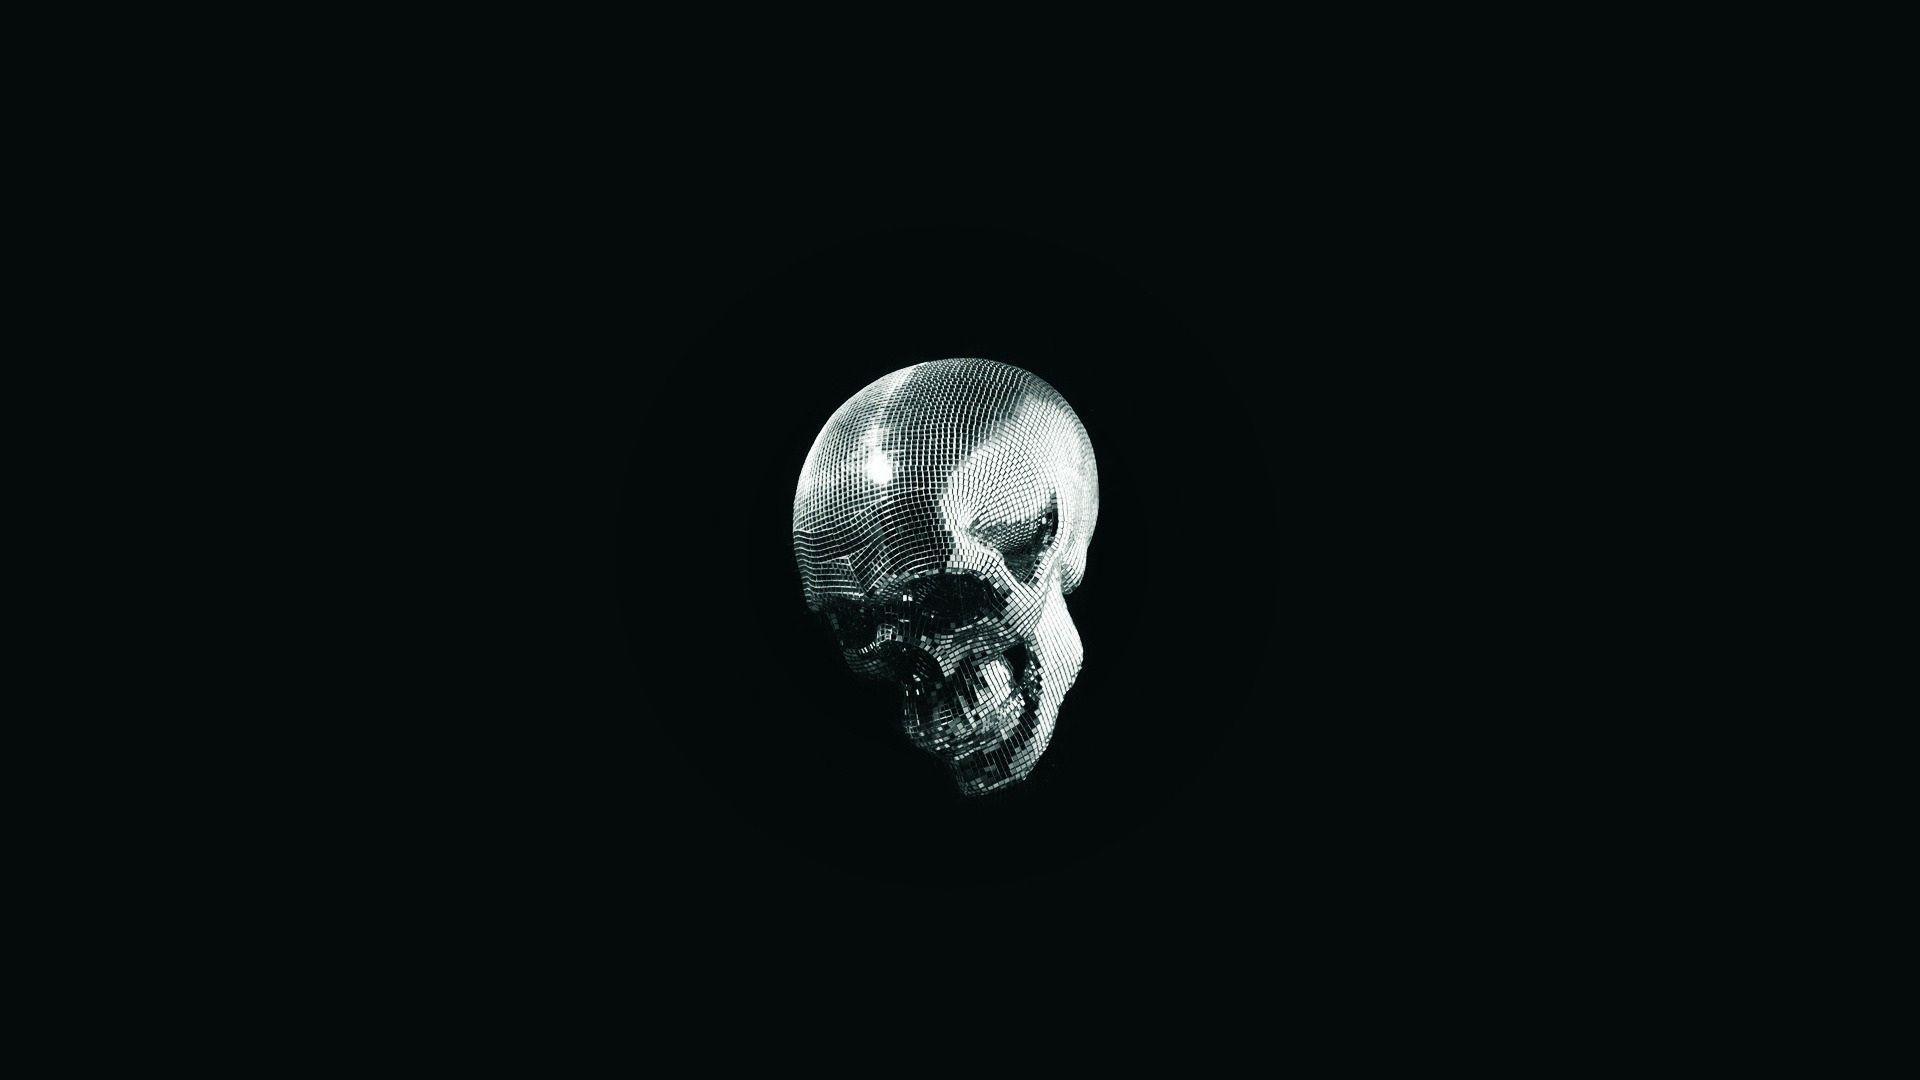 Skull Black Background - WallpaperSafari